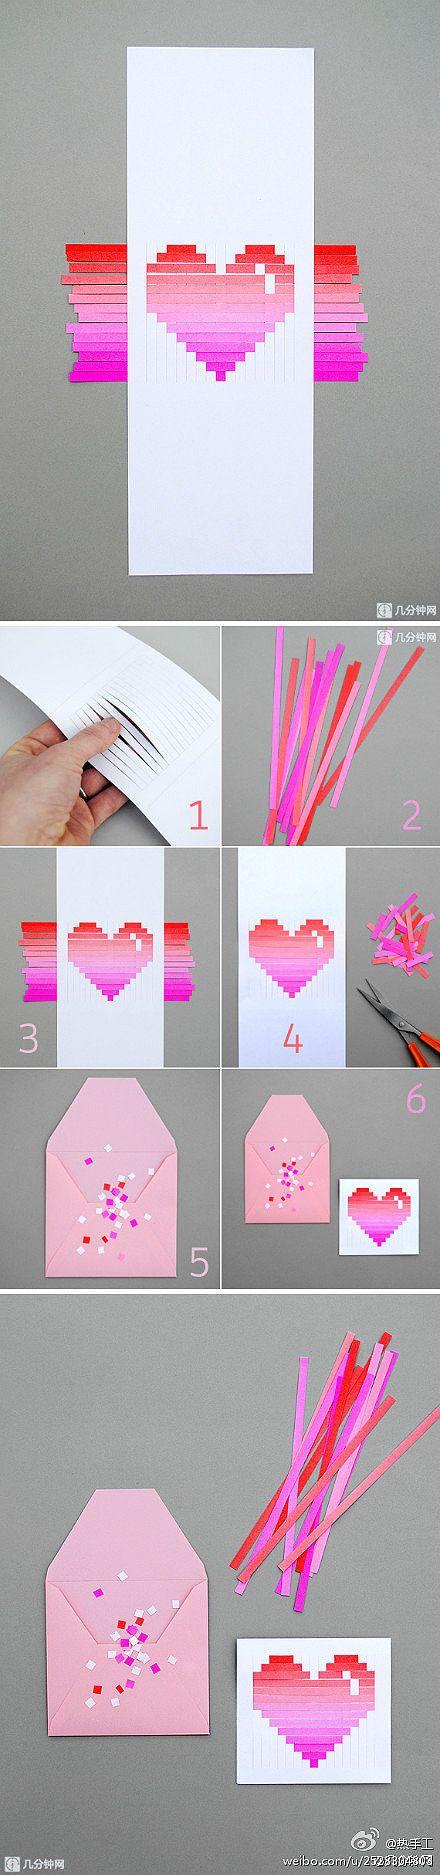 diseños de sobres de cartas para San Valentin